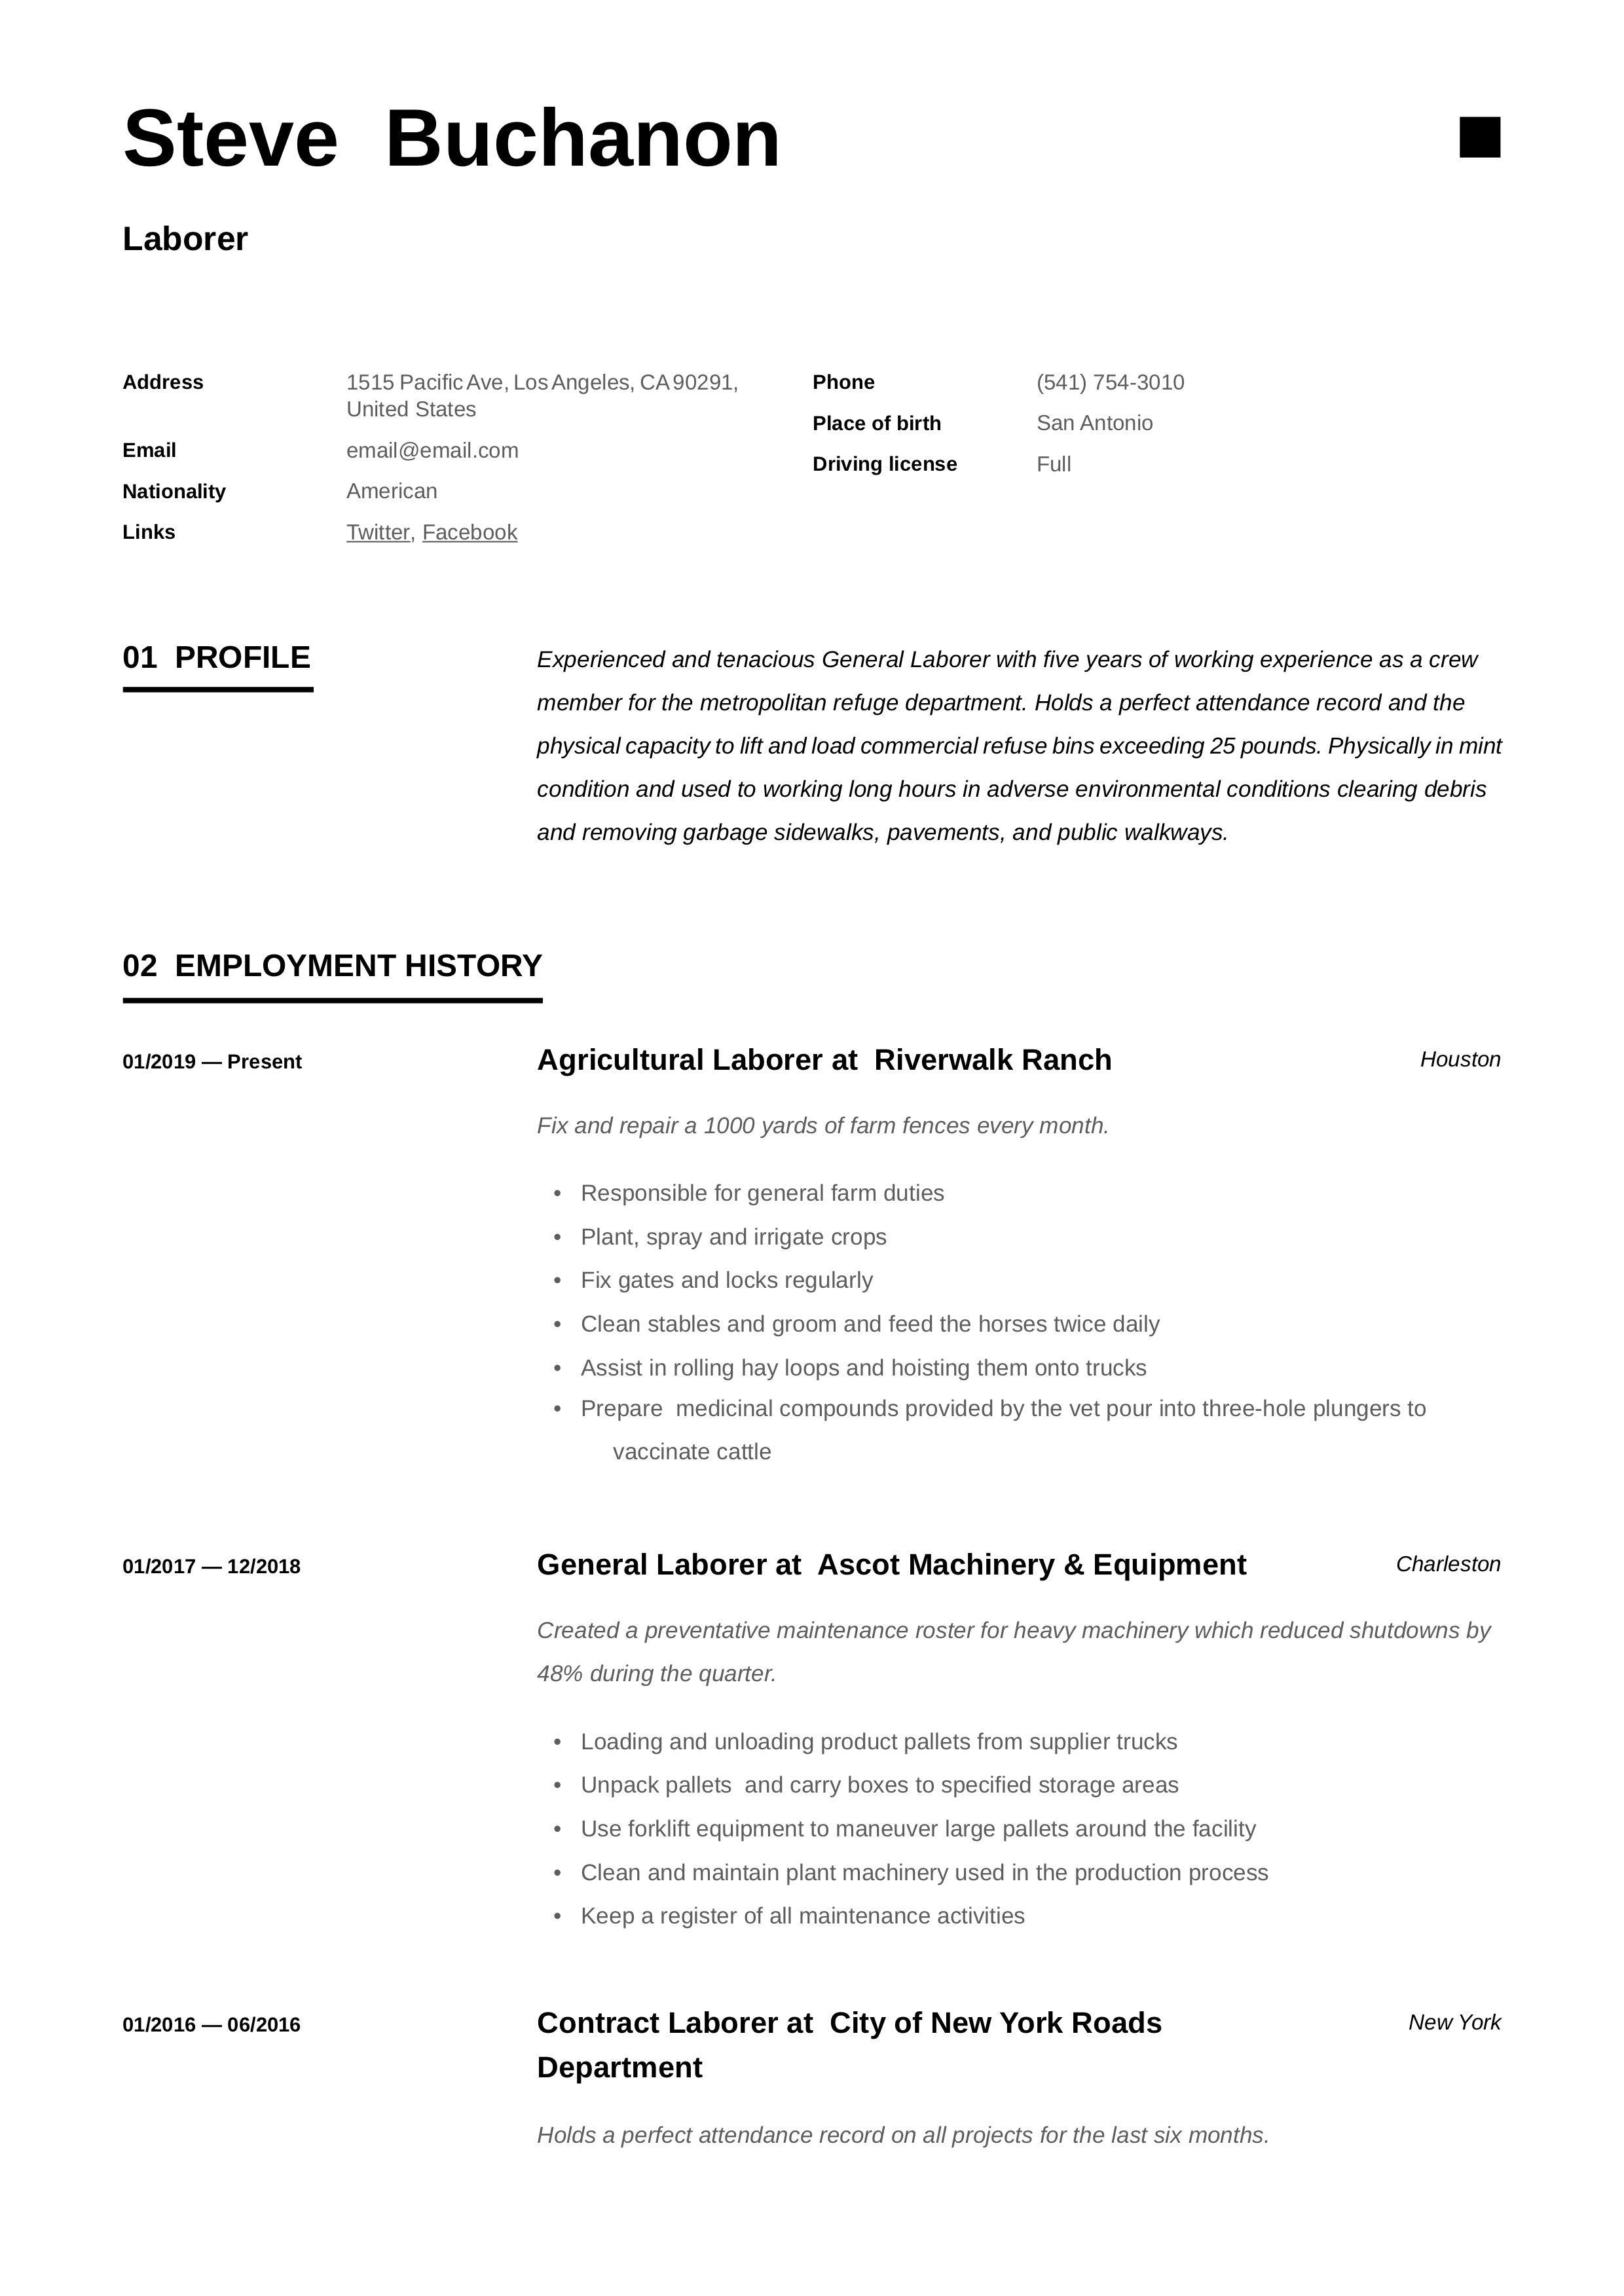 General Laborer Resume Template in 2020 Sample resume